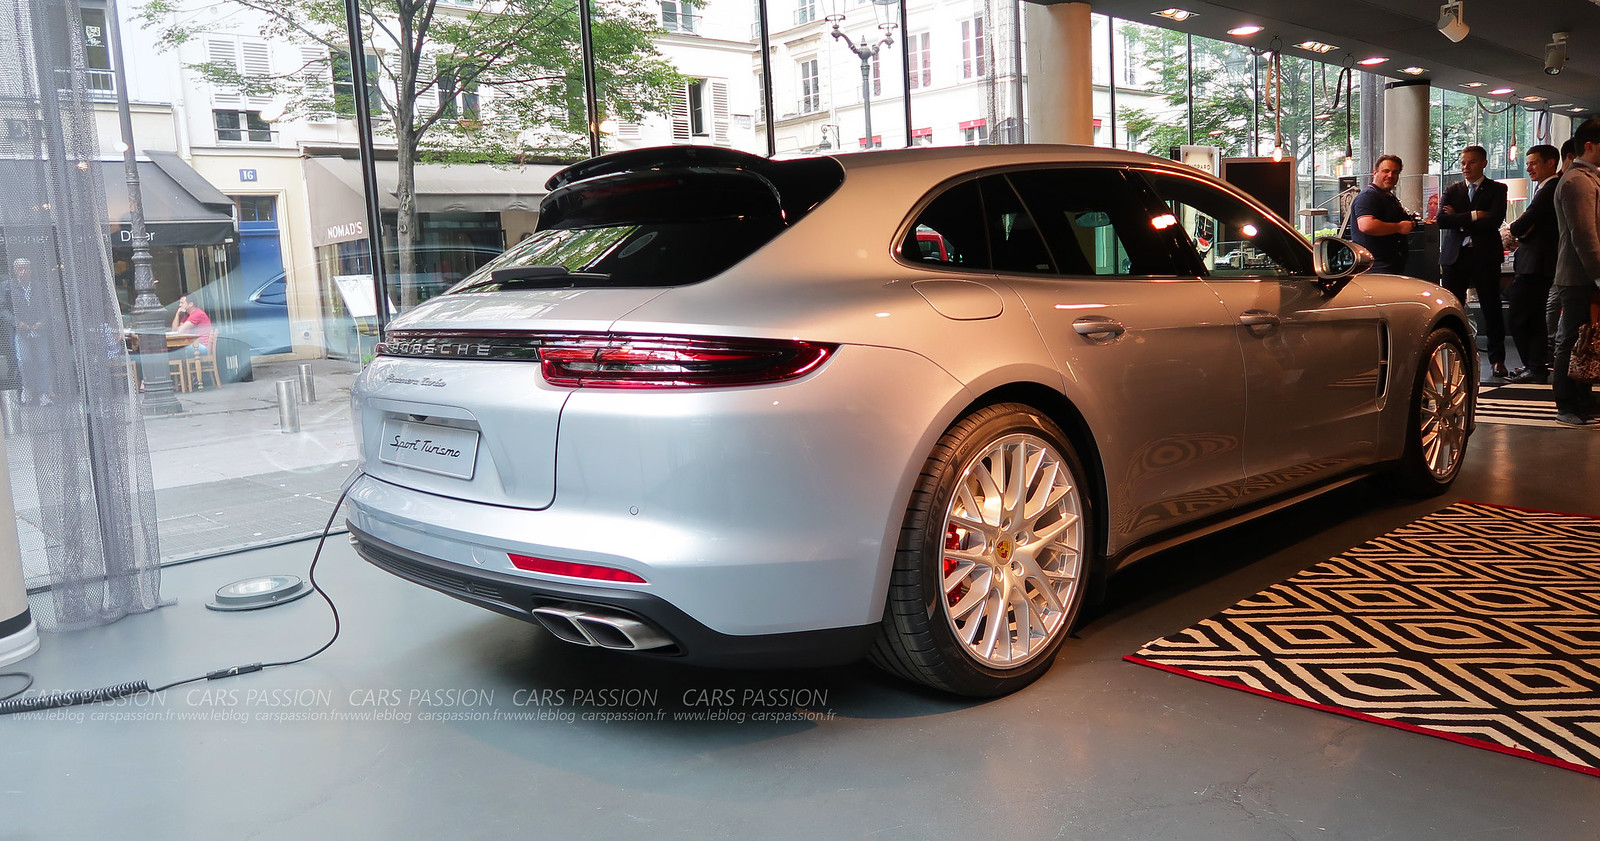 Porsche-panamera-Turbo-Turismo-2017 (10)